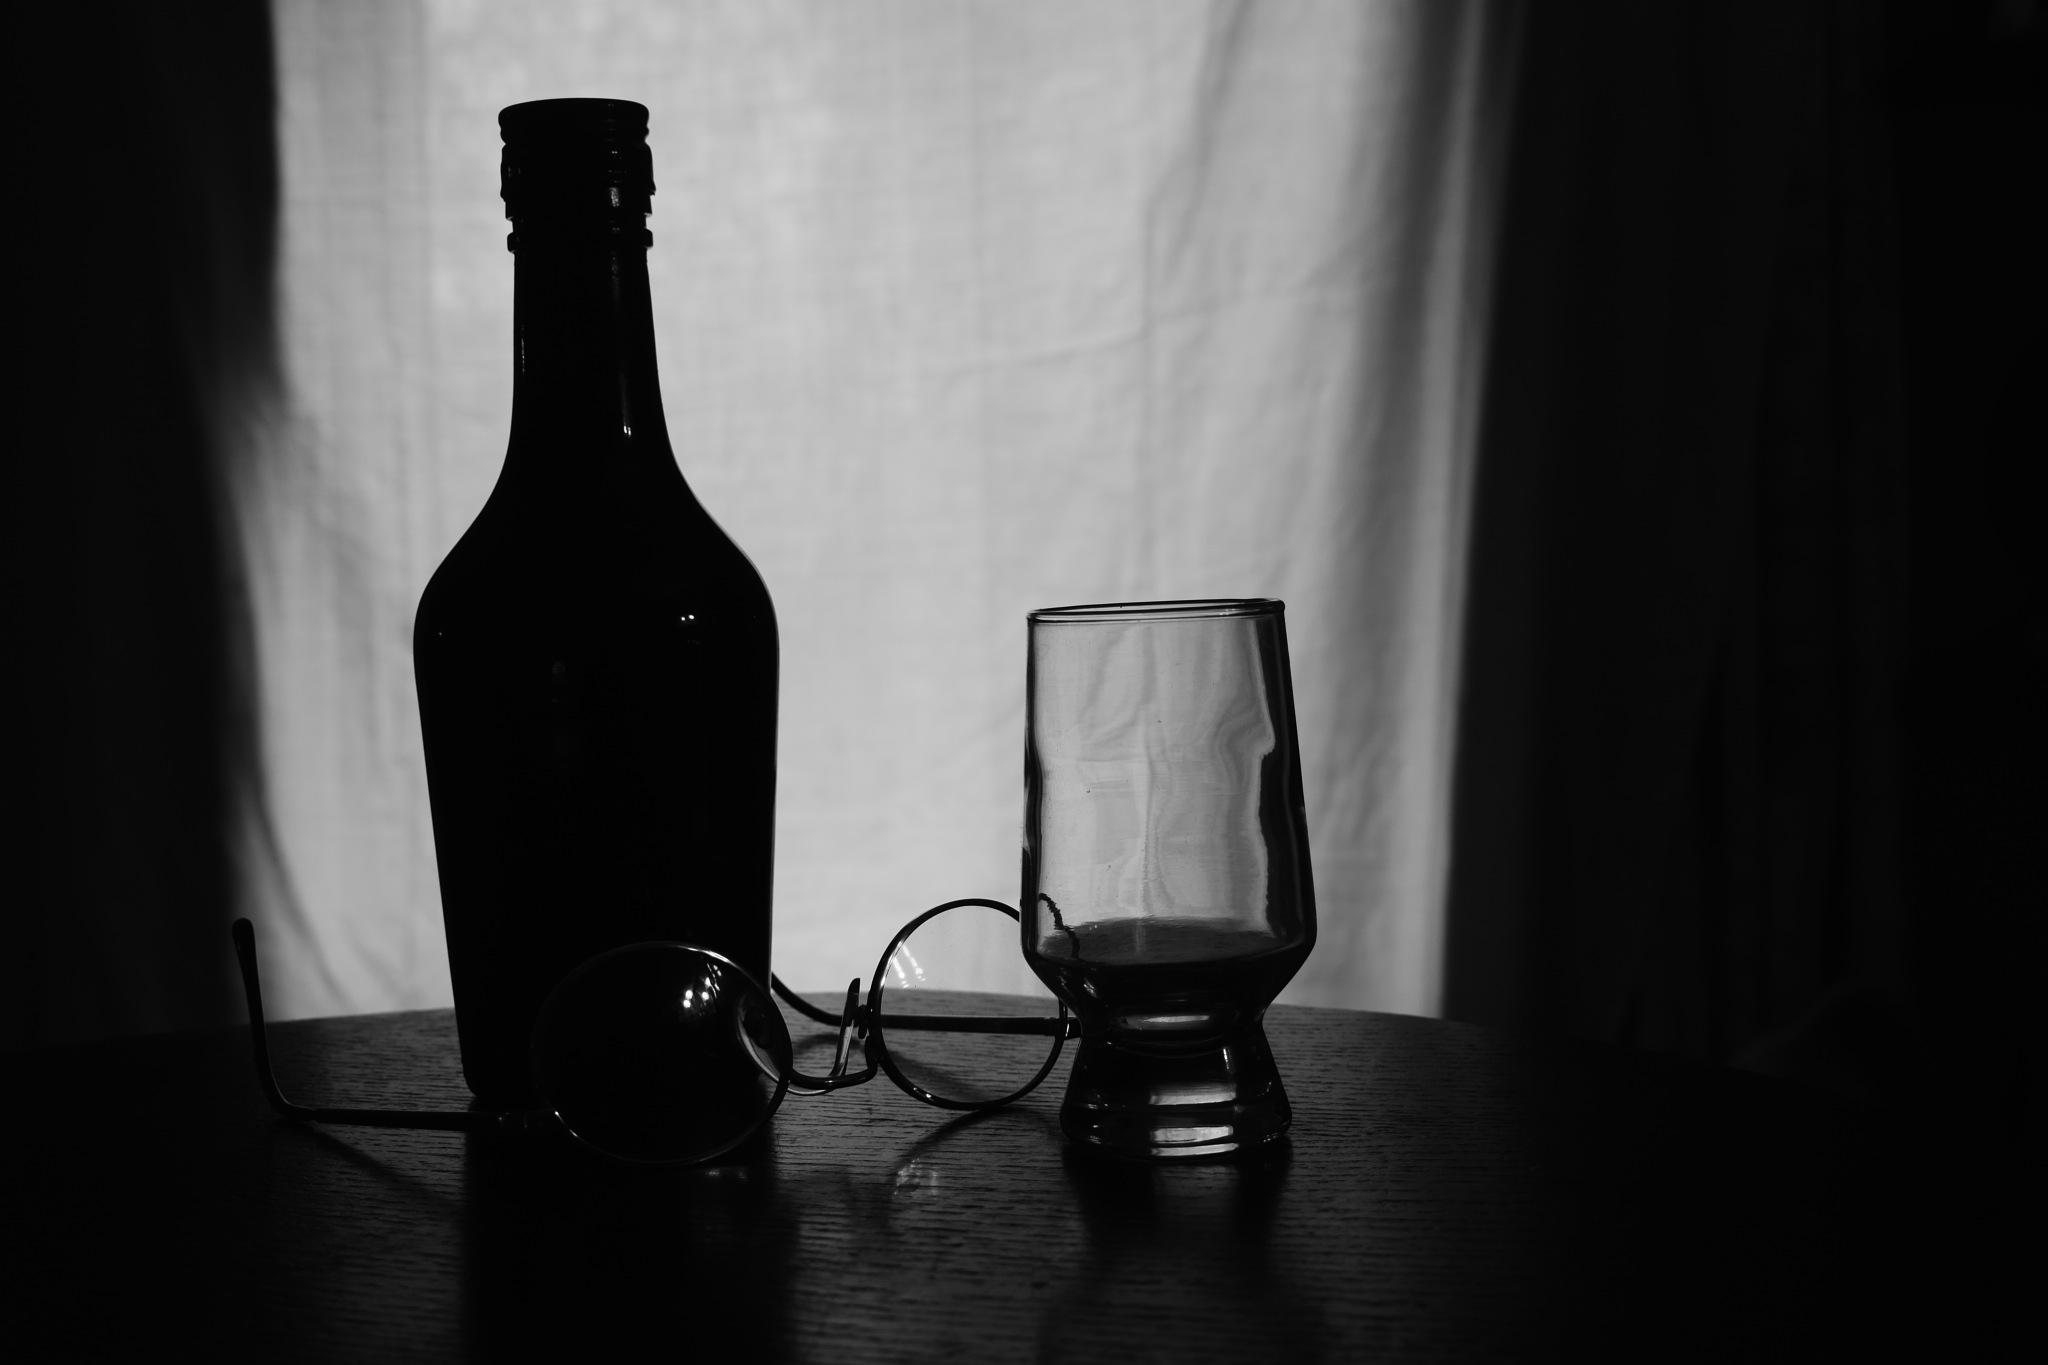 gLaSS boTTle by Ian Alastair Trenor Photography